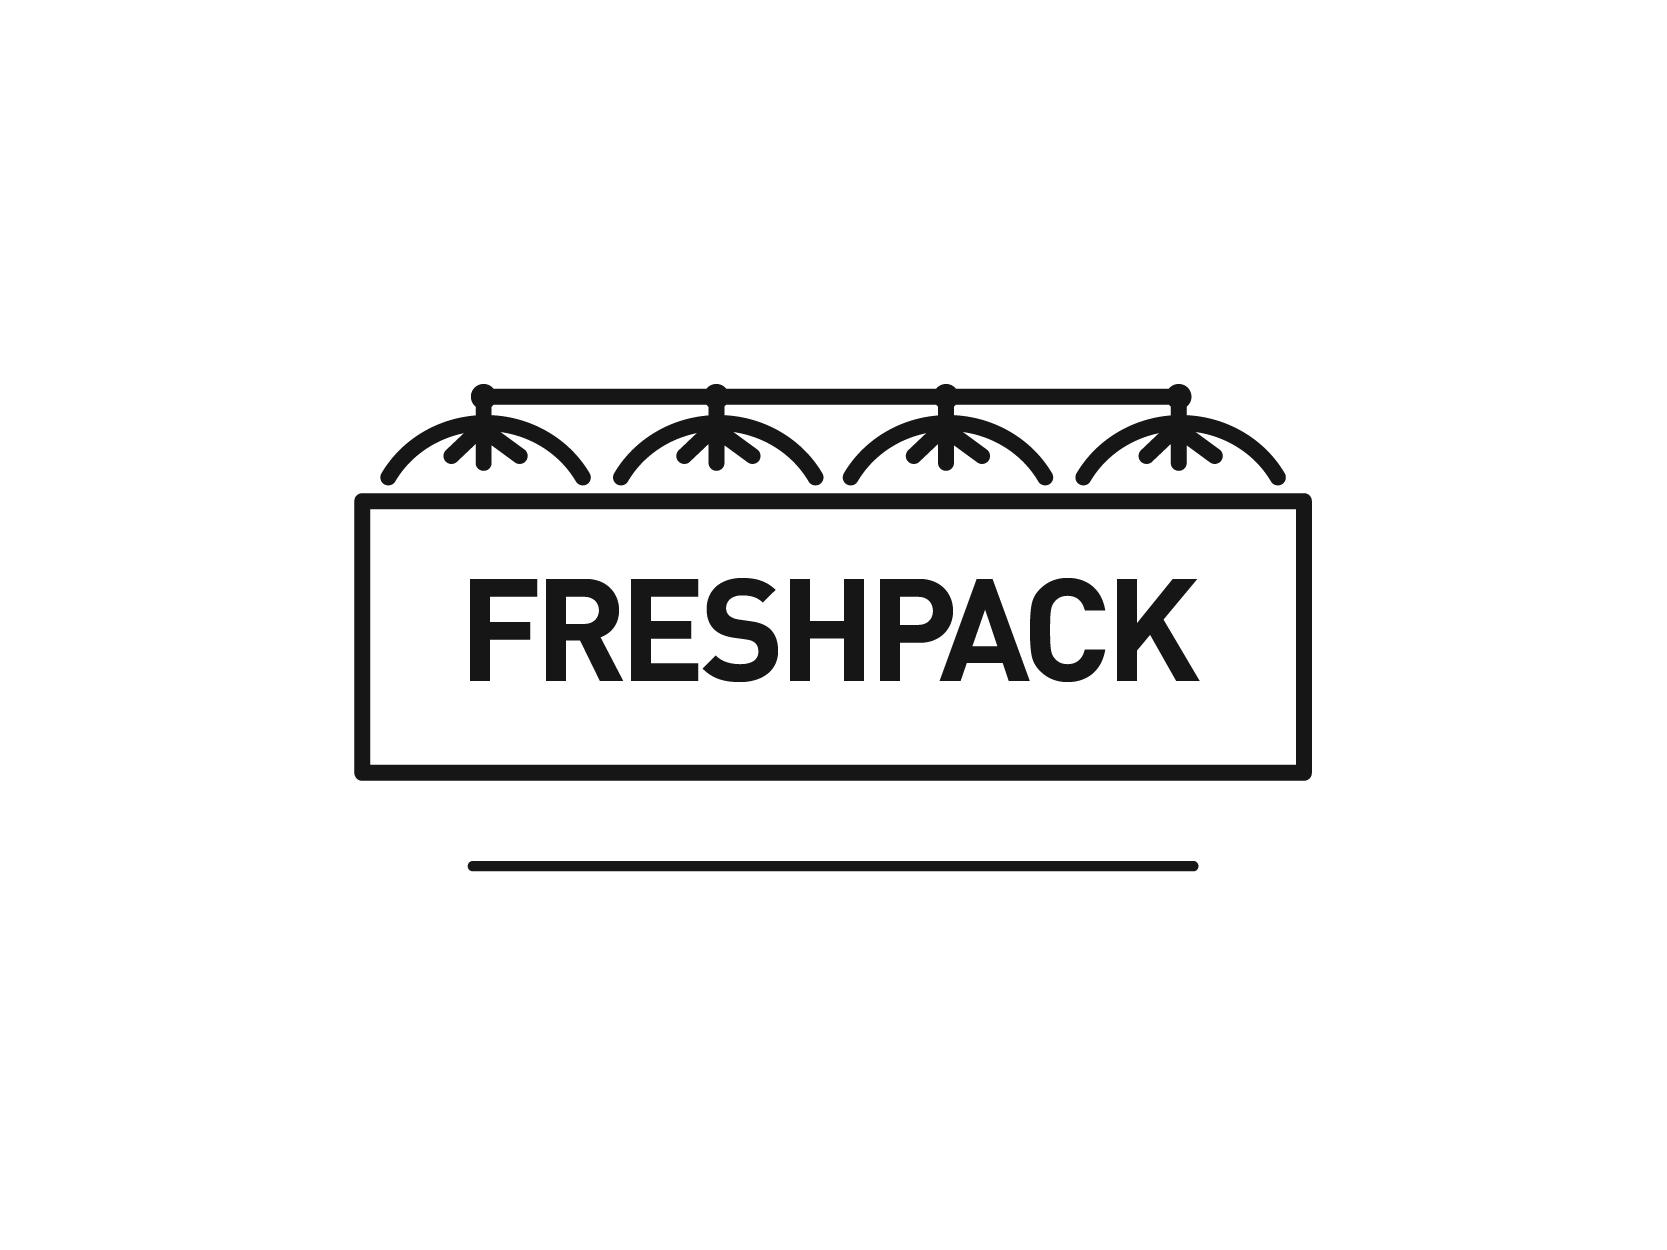 Freshpacklogo_completition-01